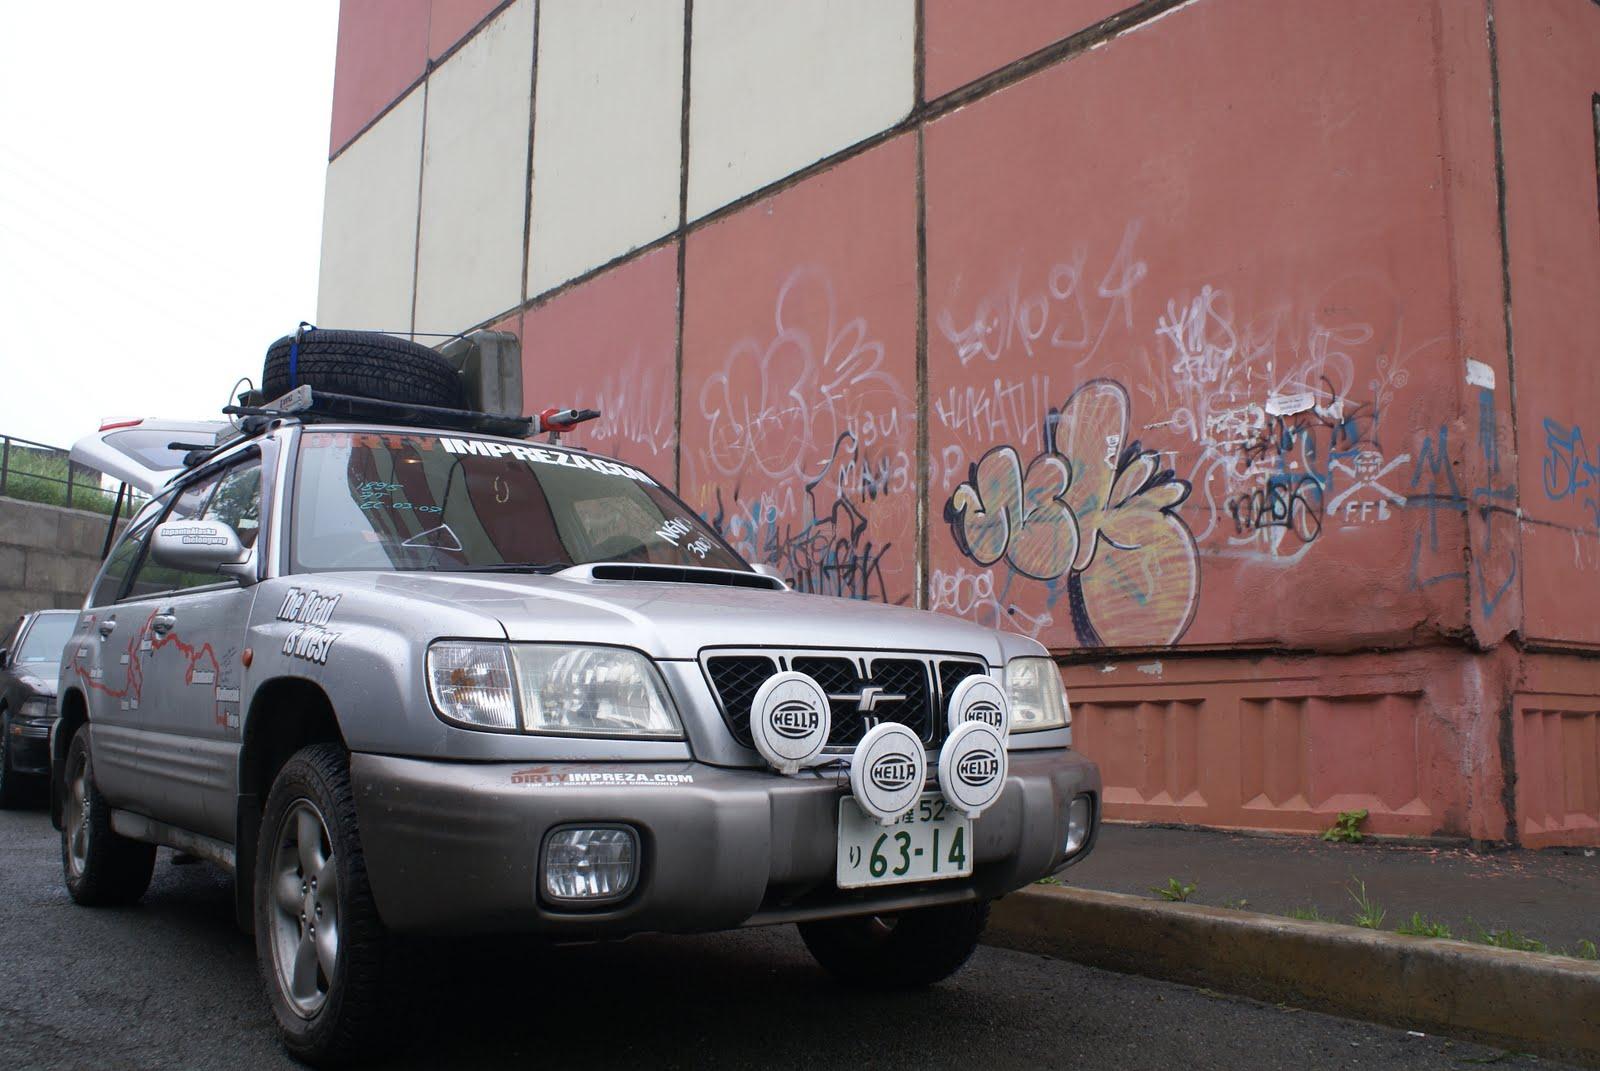 The first car, a 2002 Subaru Forestor, all prepped in Vladivostok, Russia.